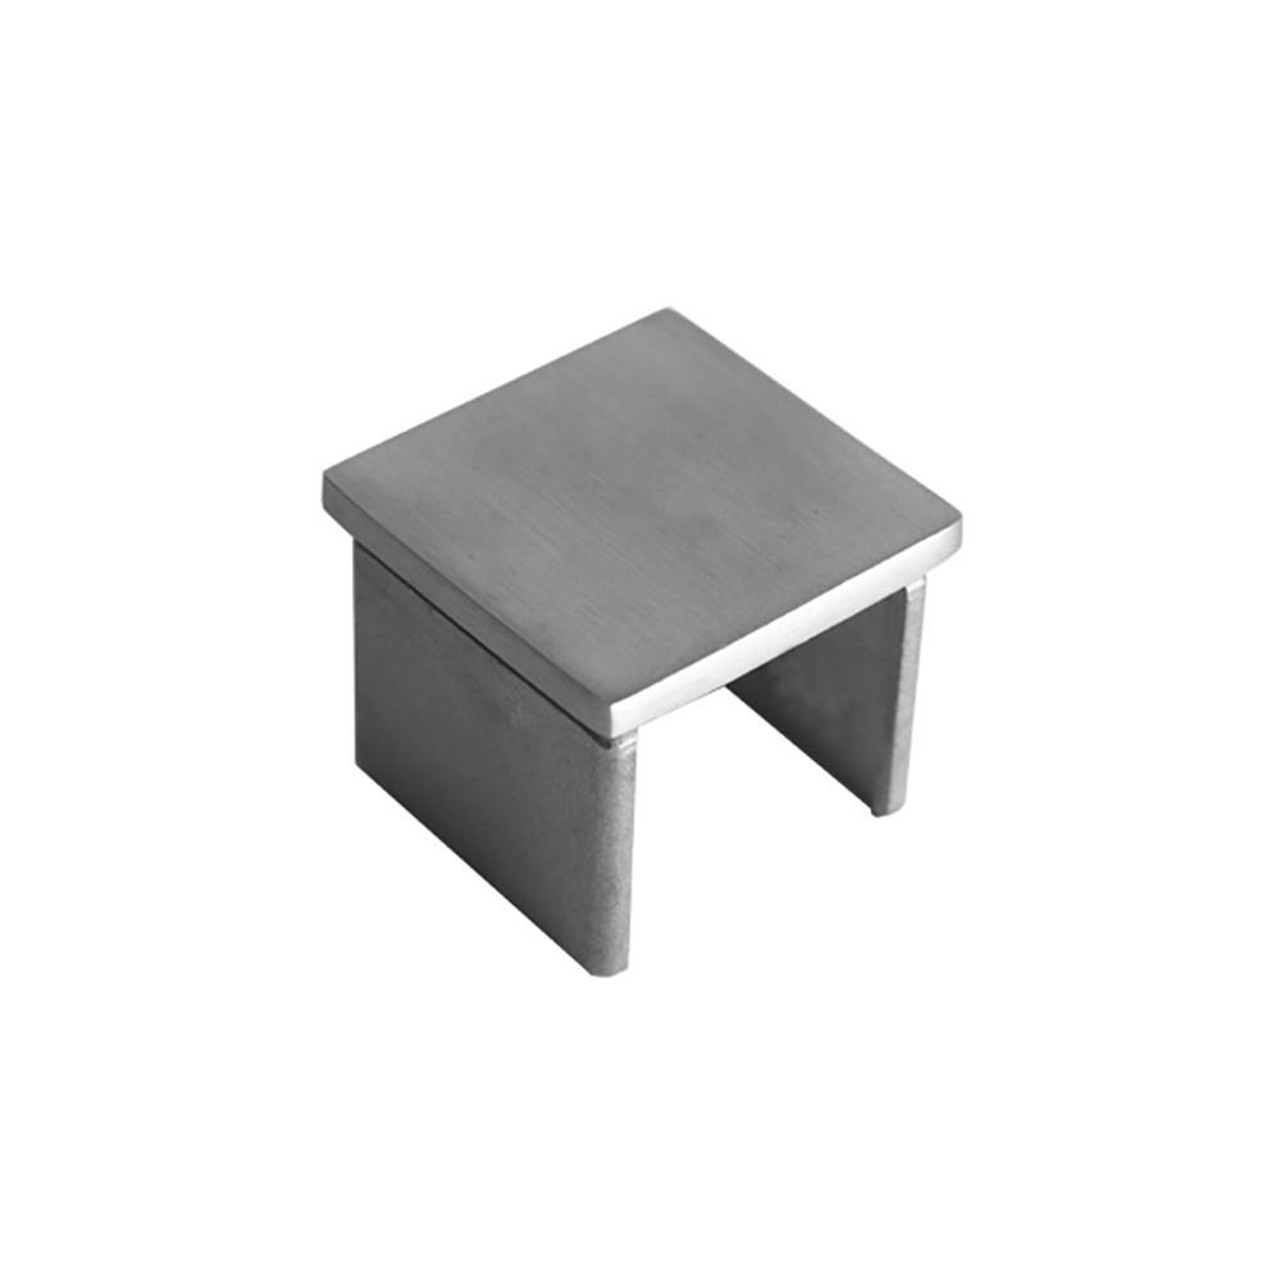 Square Glass Cap Rail End Cap (AX00.032.322.A.SP)